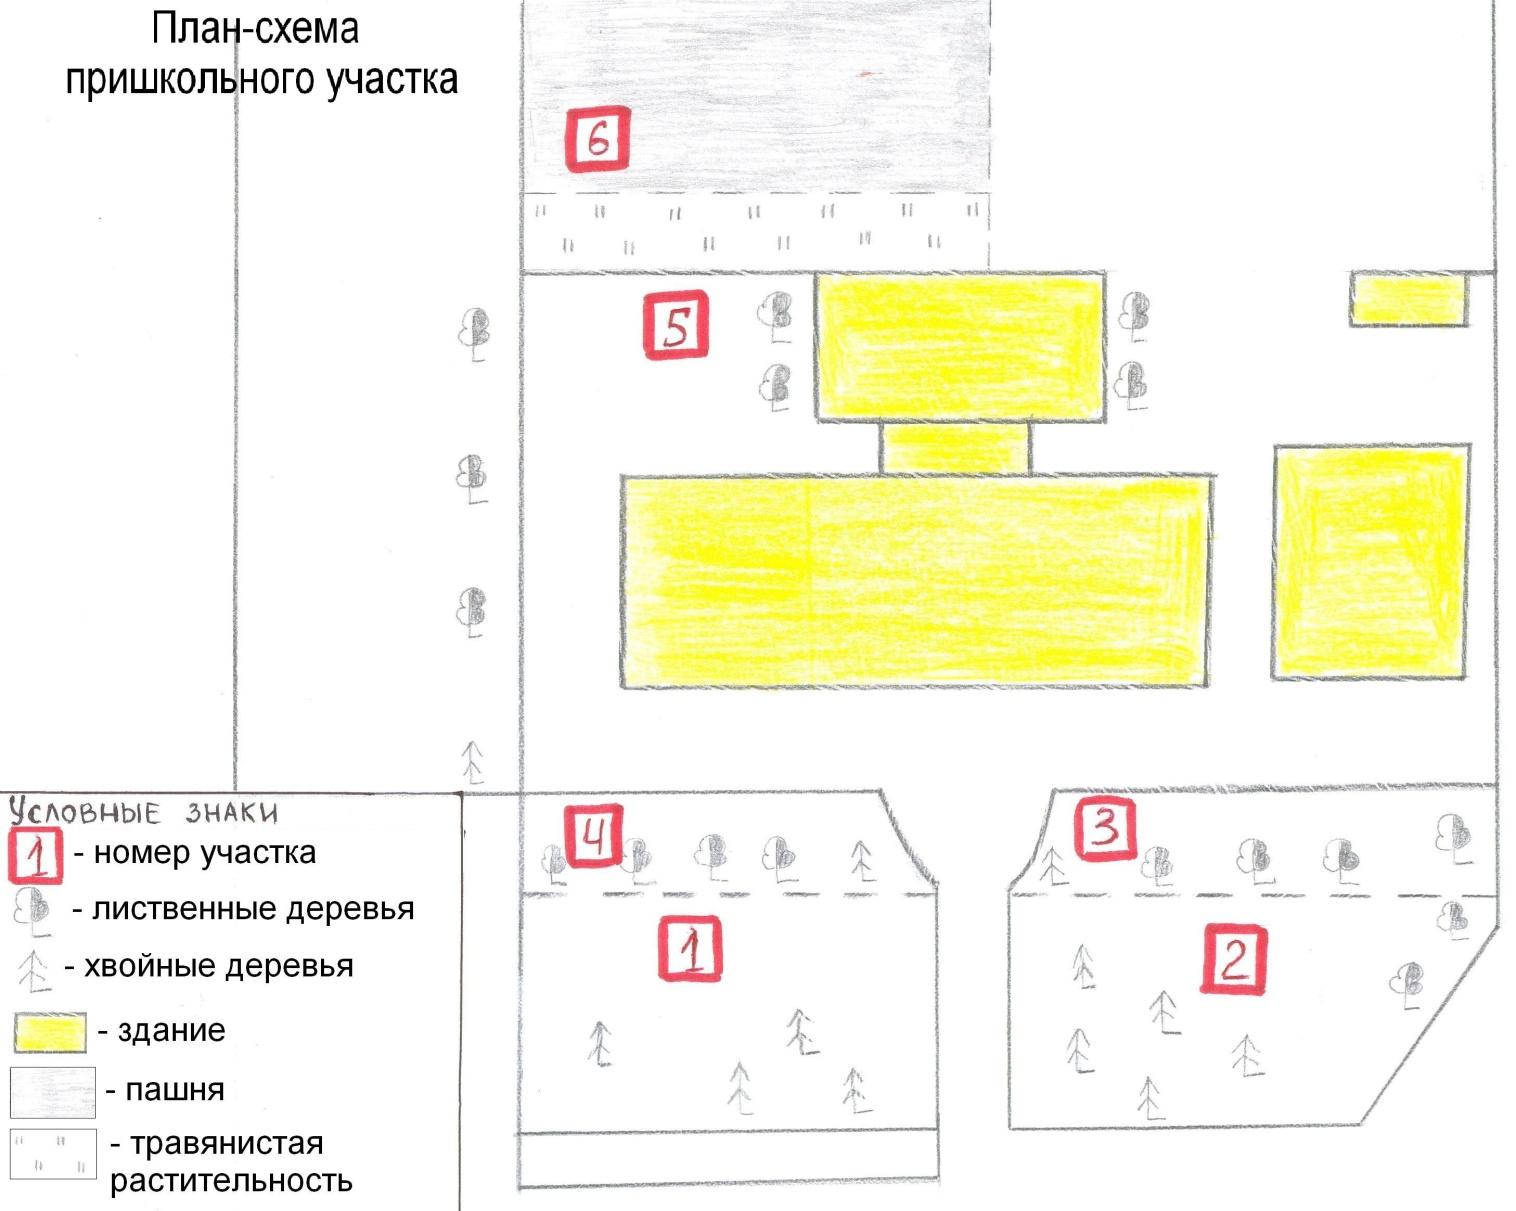 C:\Documents and Settings\Admin\Мои документы\Downloads\1 003.jpg